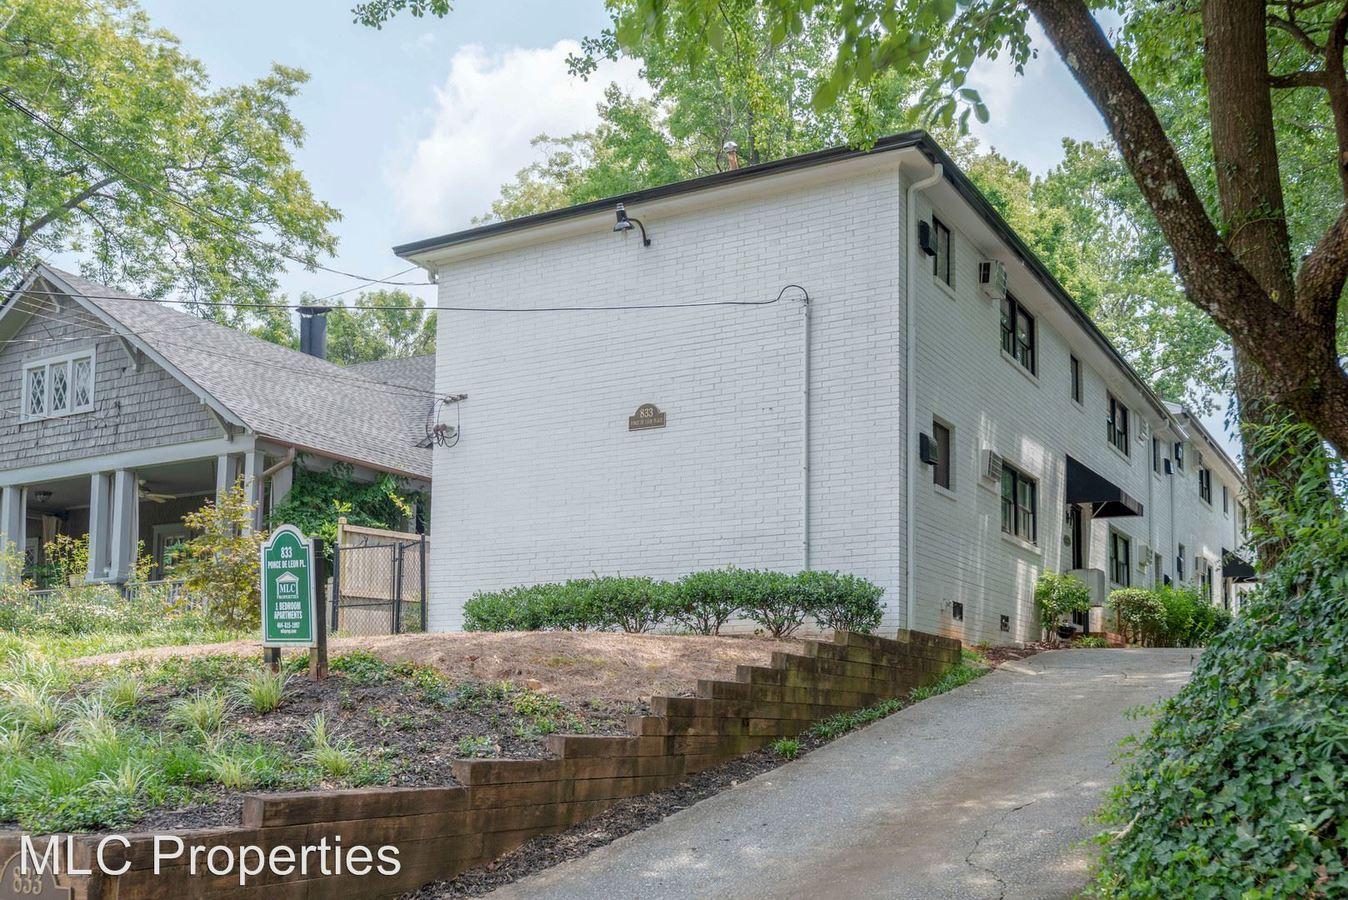 1 Bedroom 1 Bathroom Apartment for rent at 833 Ponce De Leon Place in Atlanta, GA